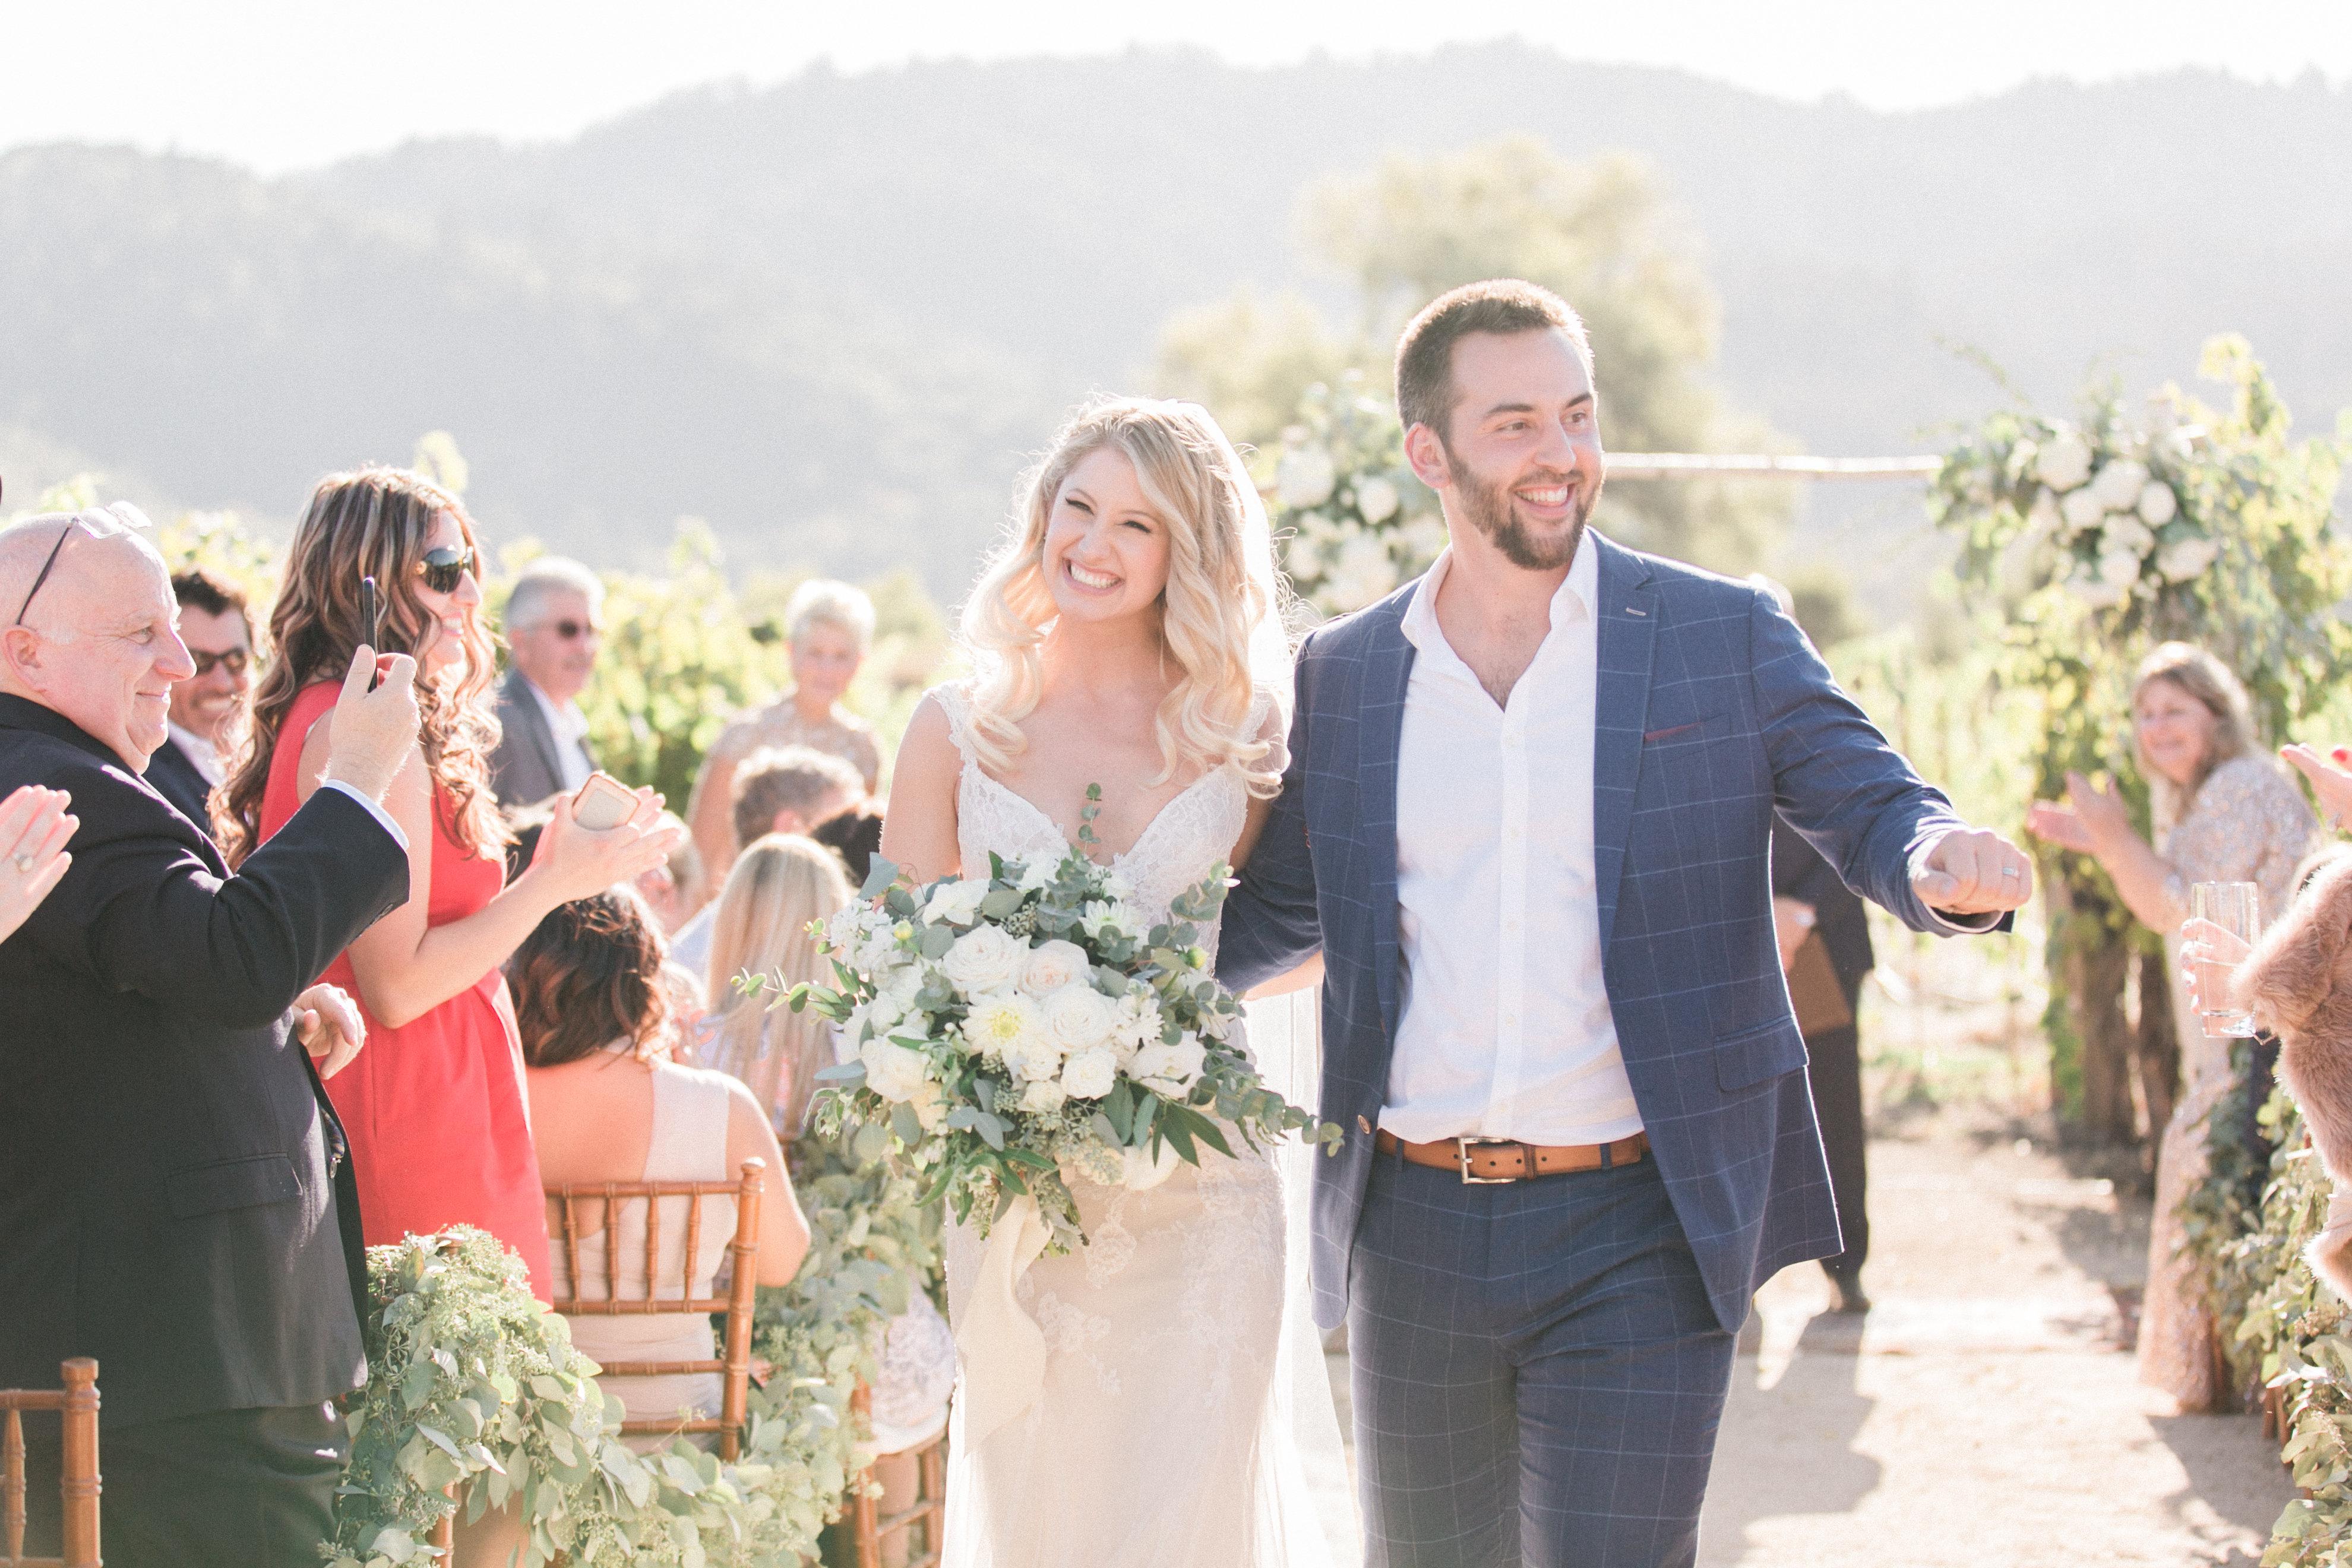 R+C Wedding